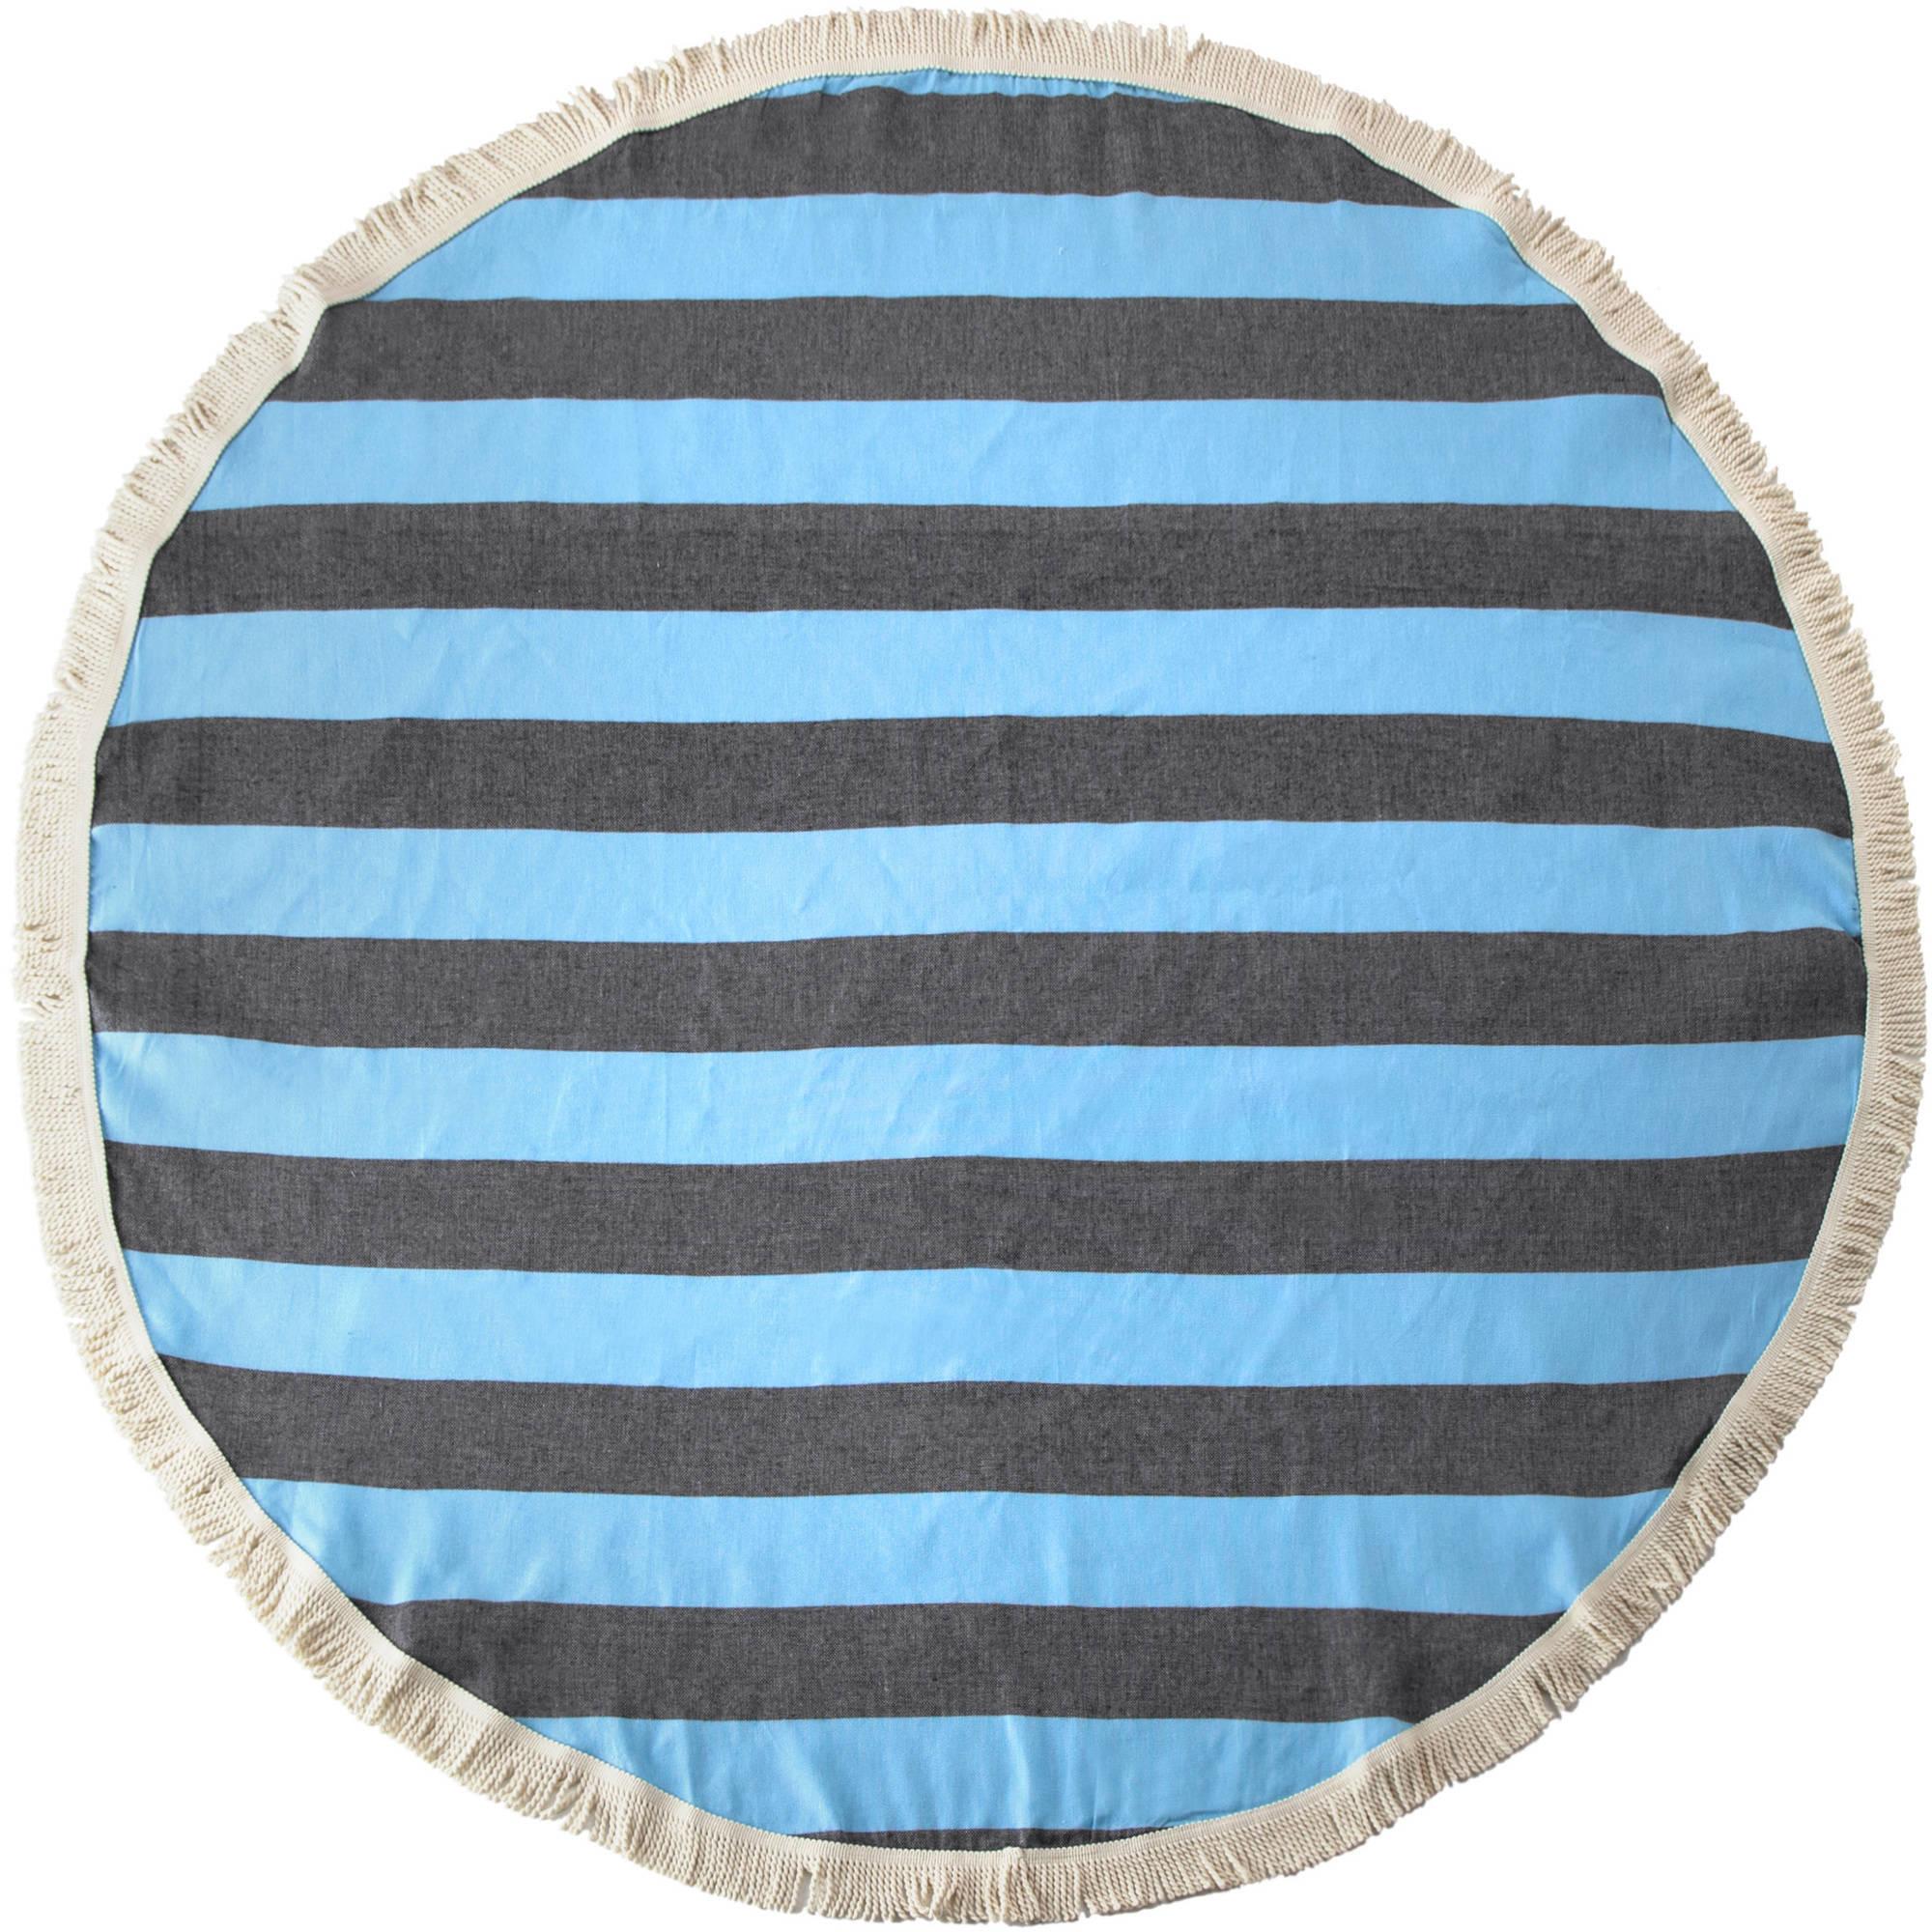 Enchante Home Marmaris Round Beach Towel